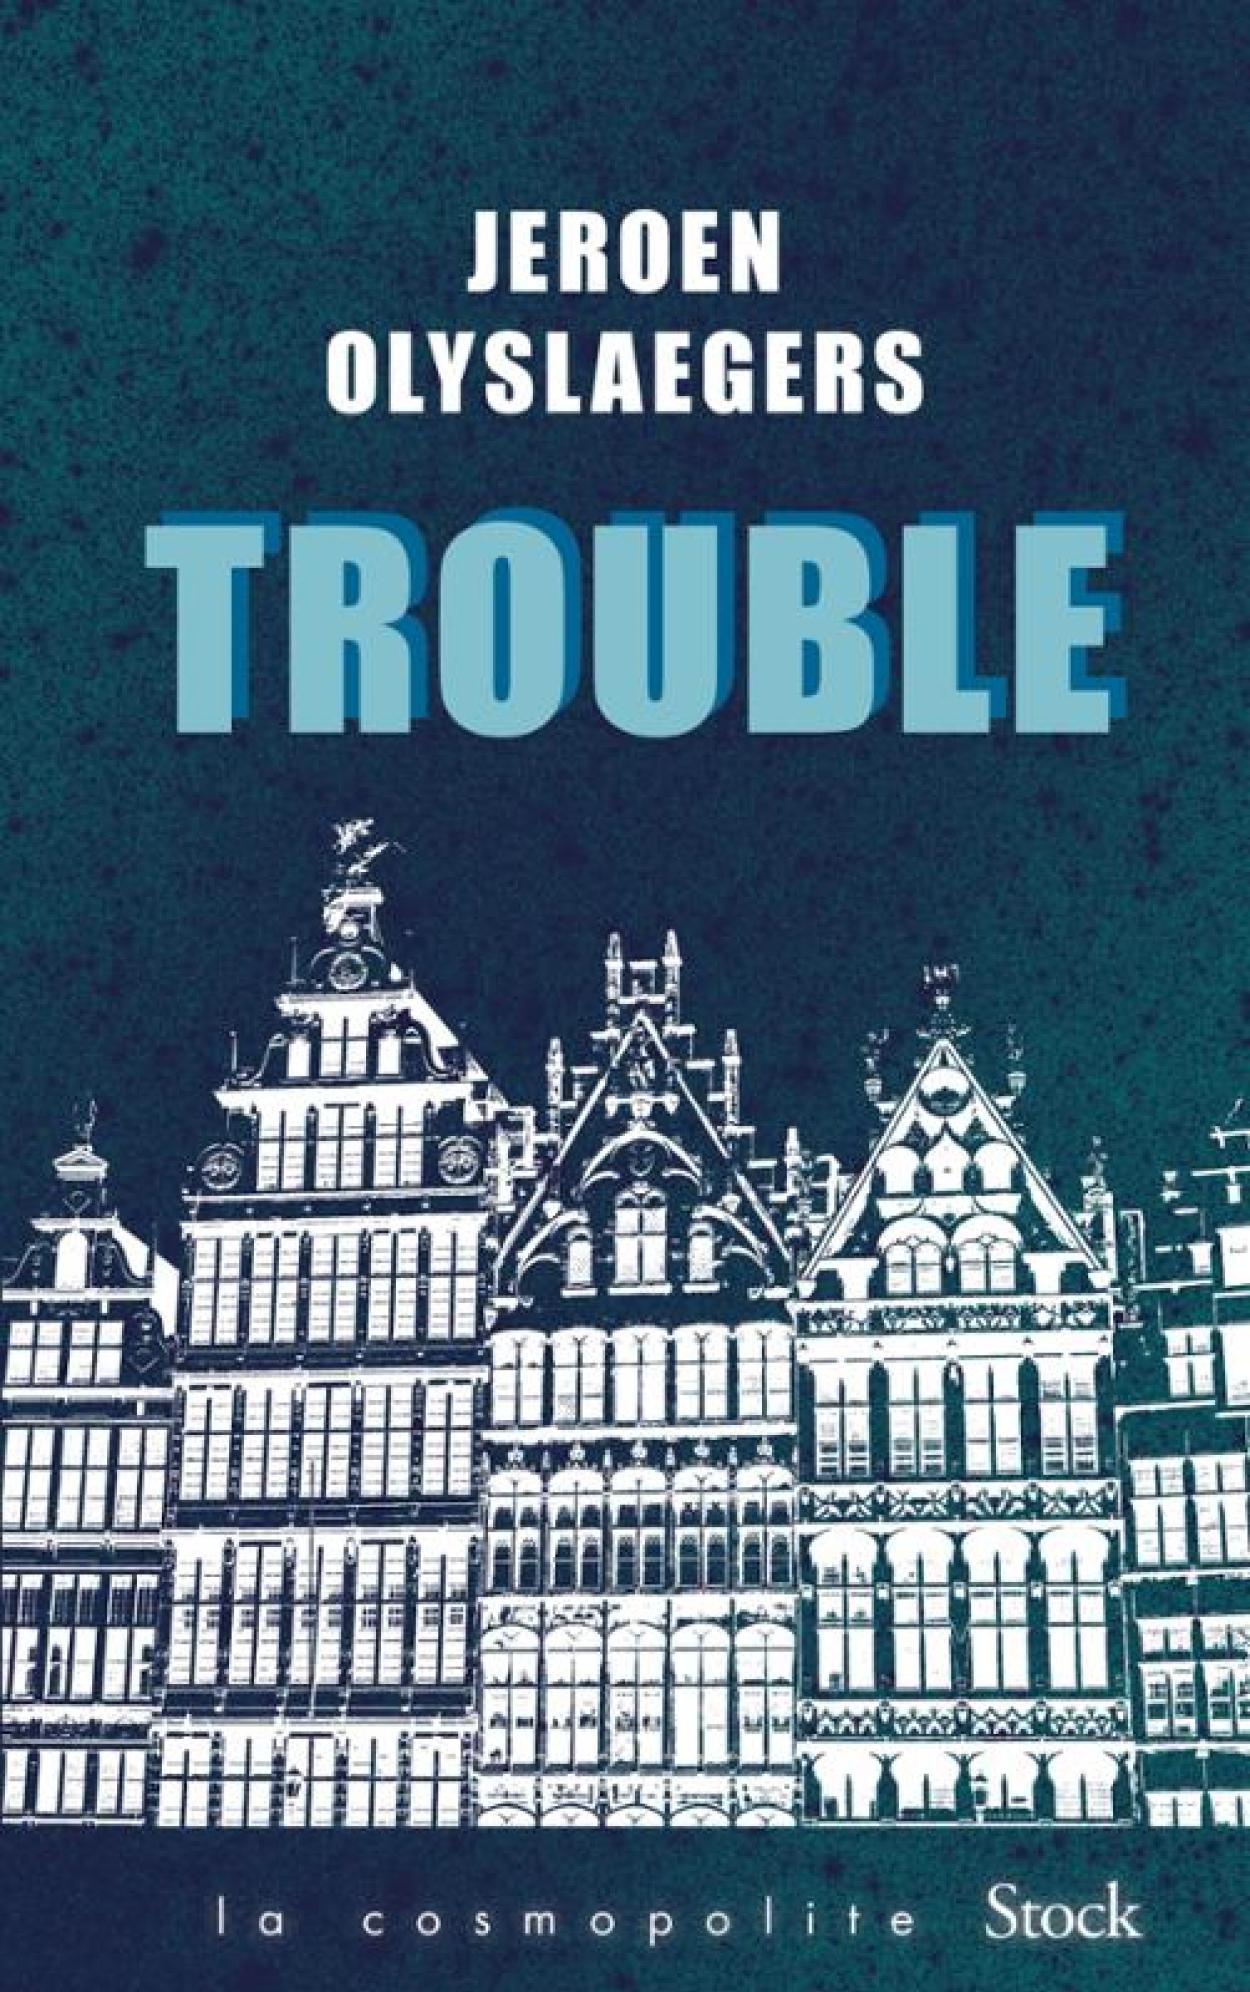 olyslaegers-trouble.jpg